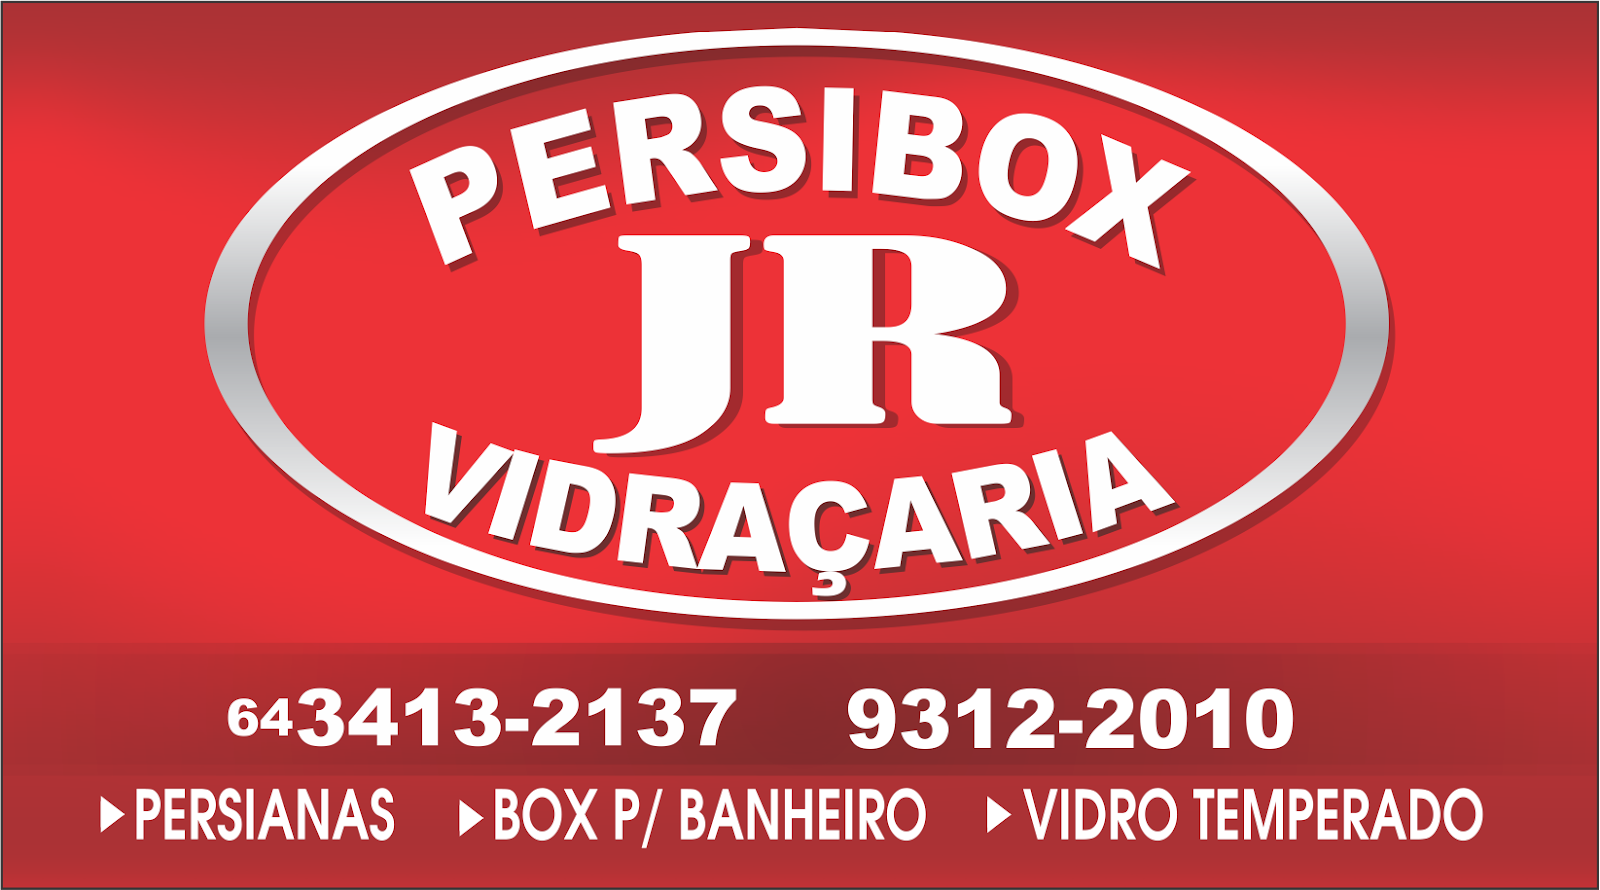 Persibox JR Vidraçaria